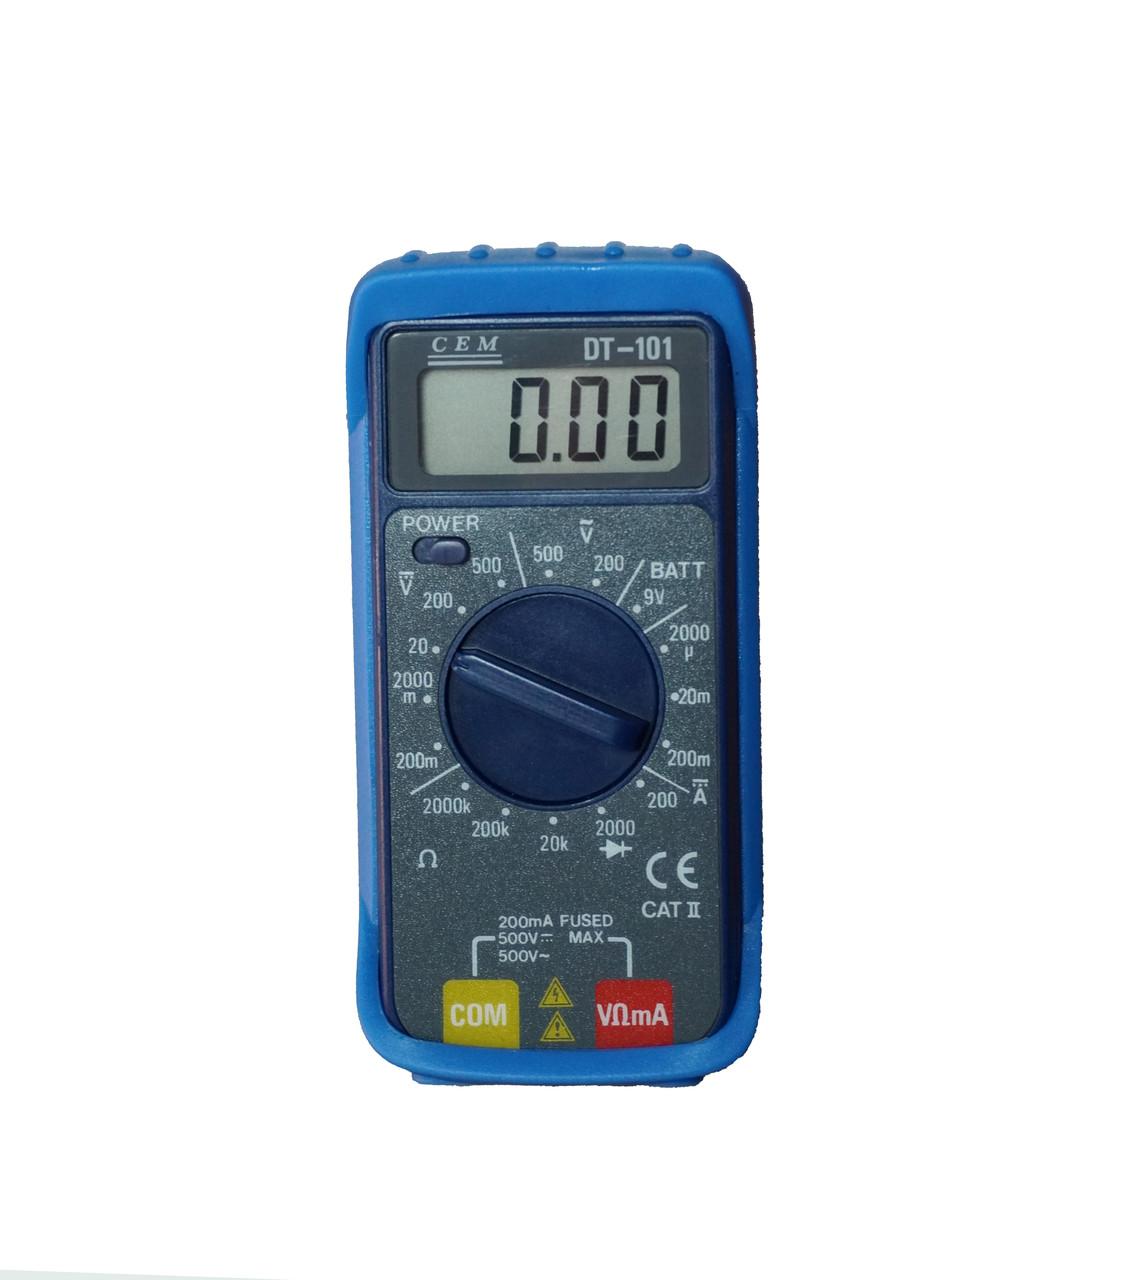 DT-101 Мультиметр цифровой